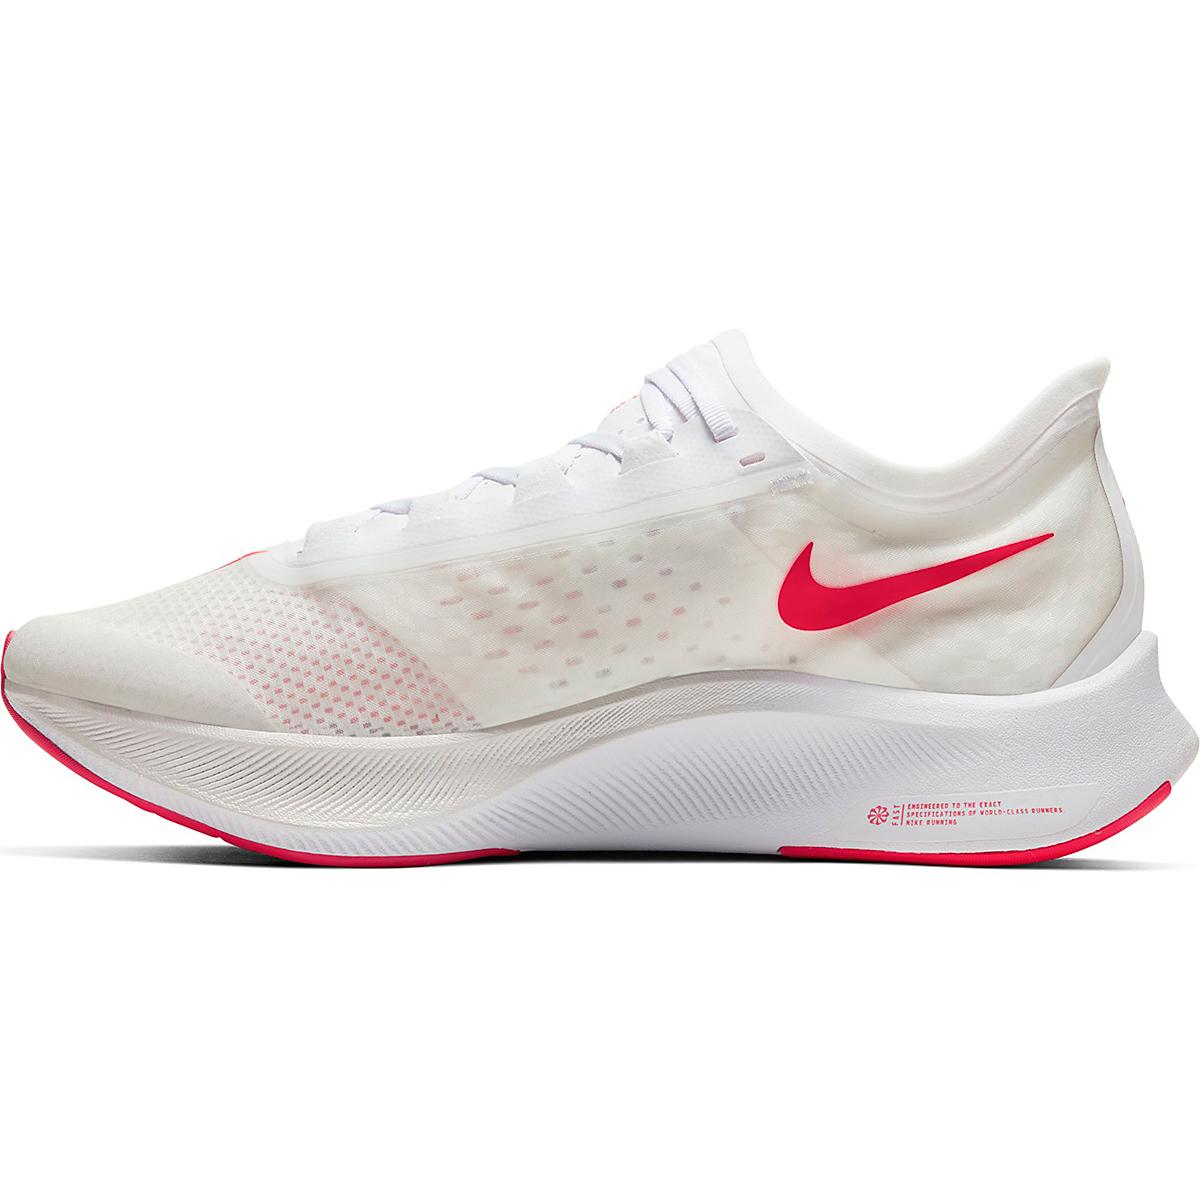 Men's Nike Zoom Fly 3 Running Shoe - Color: White/Laser Crimson - Size: 6 - Width: Regular, White/Laser Crimson, large, image 2